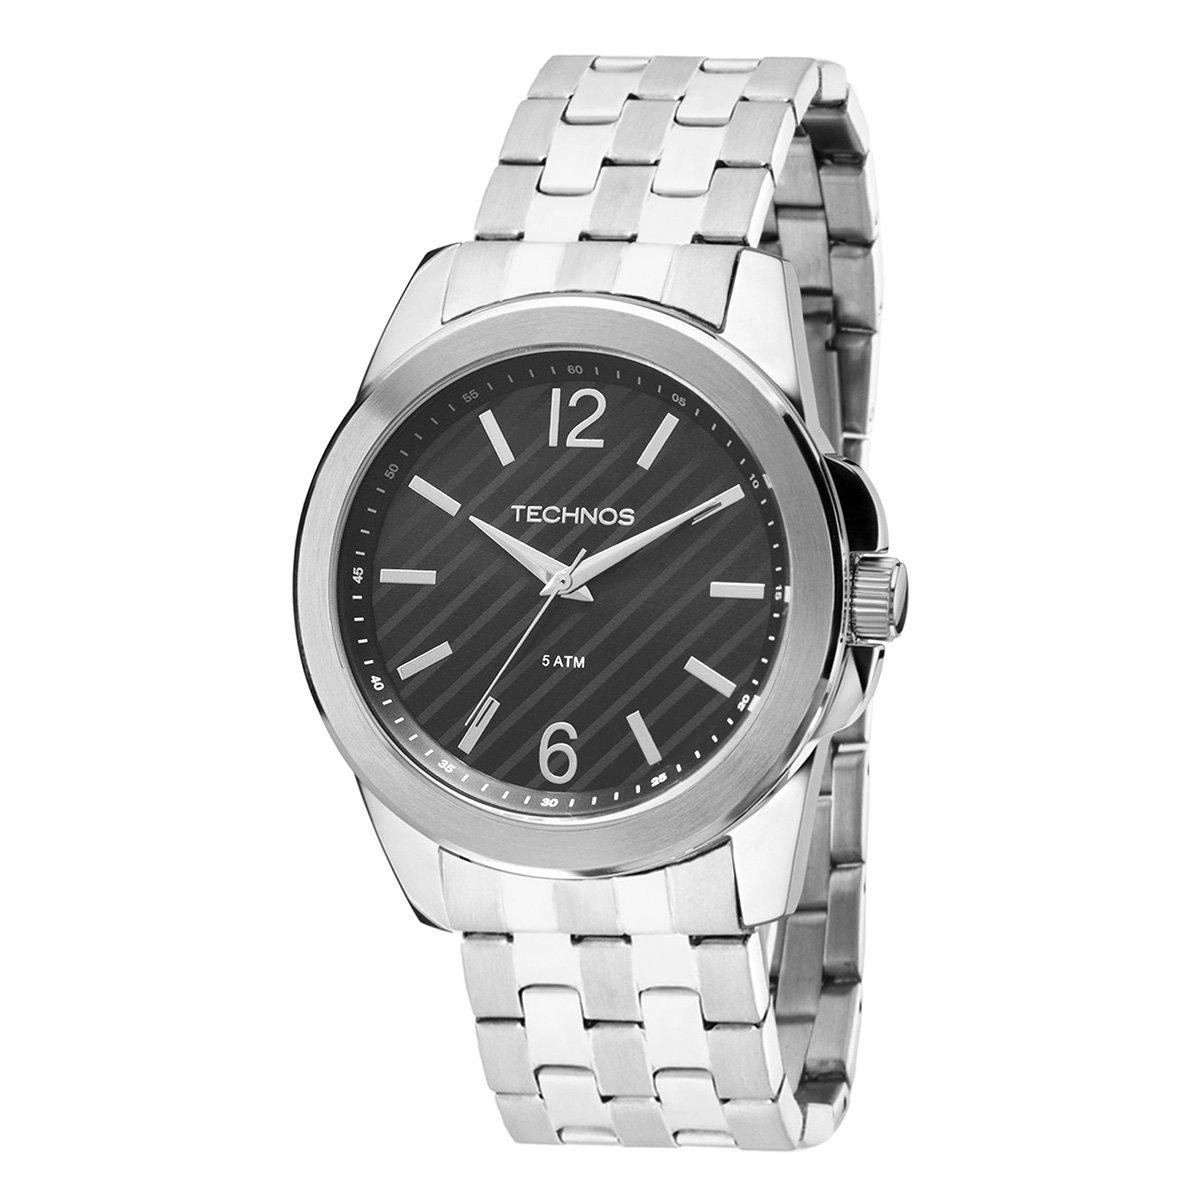 Relógio technos masculino mez compre agora zattini jpg 1200x1200 Relogios  technos black 34971ed00f